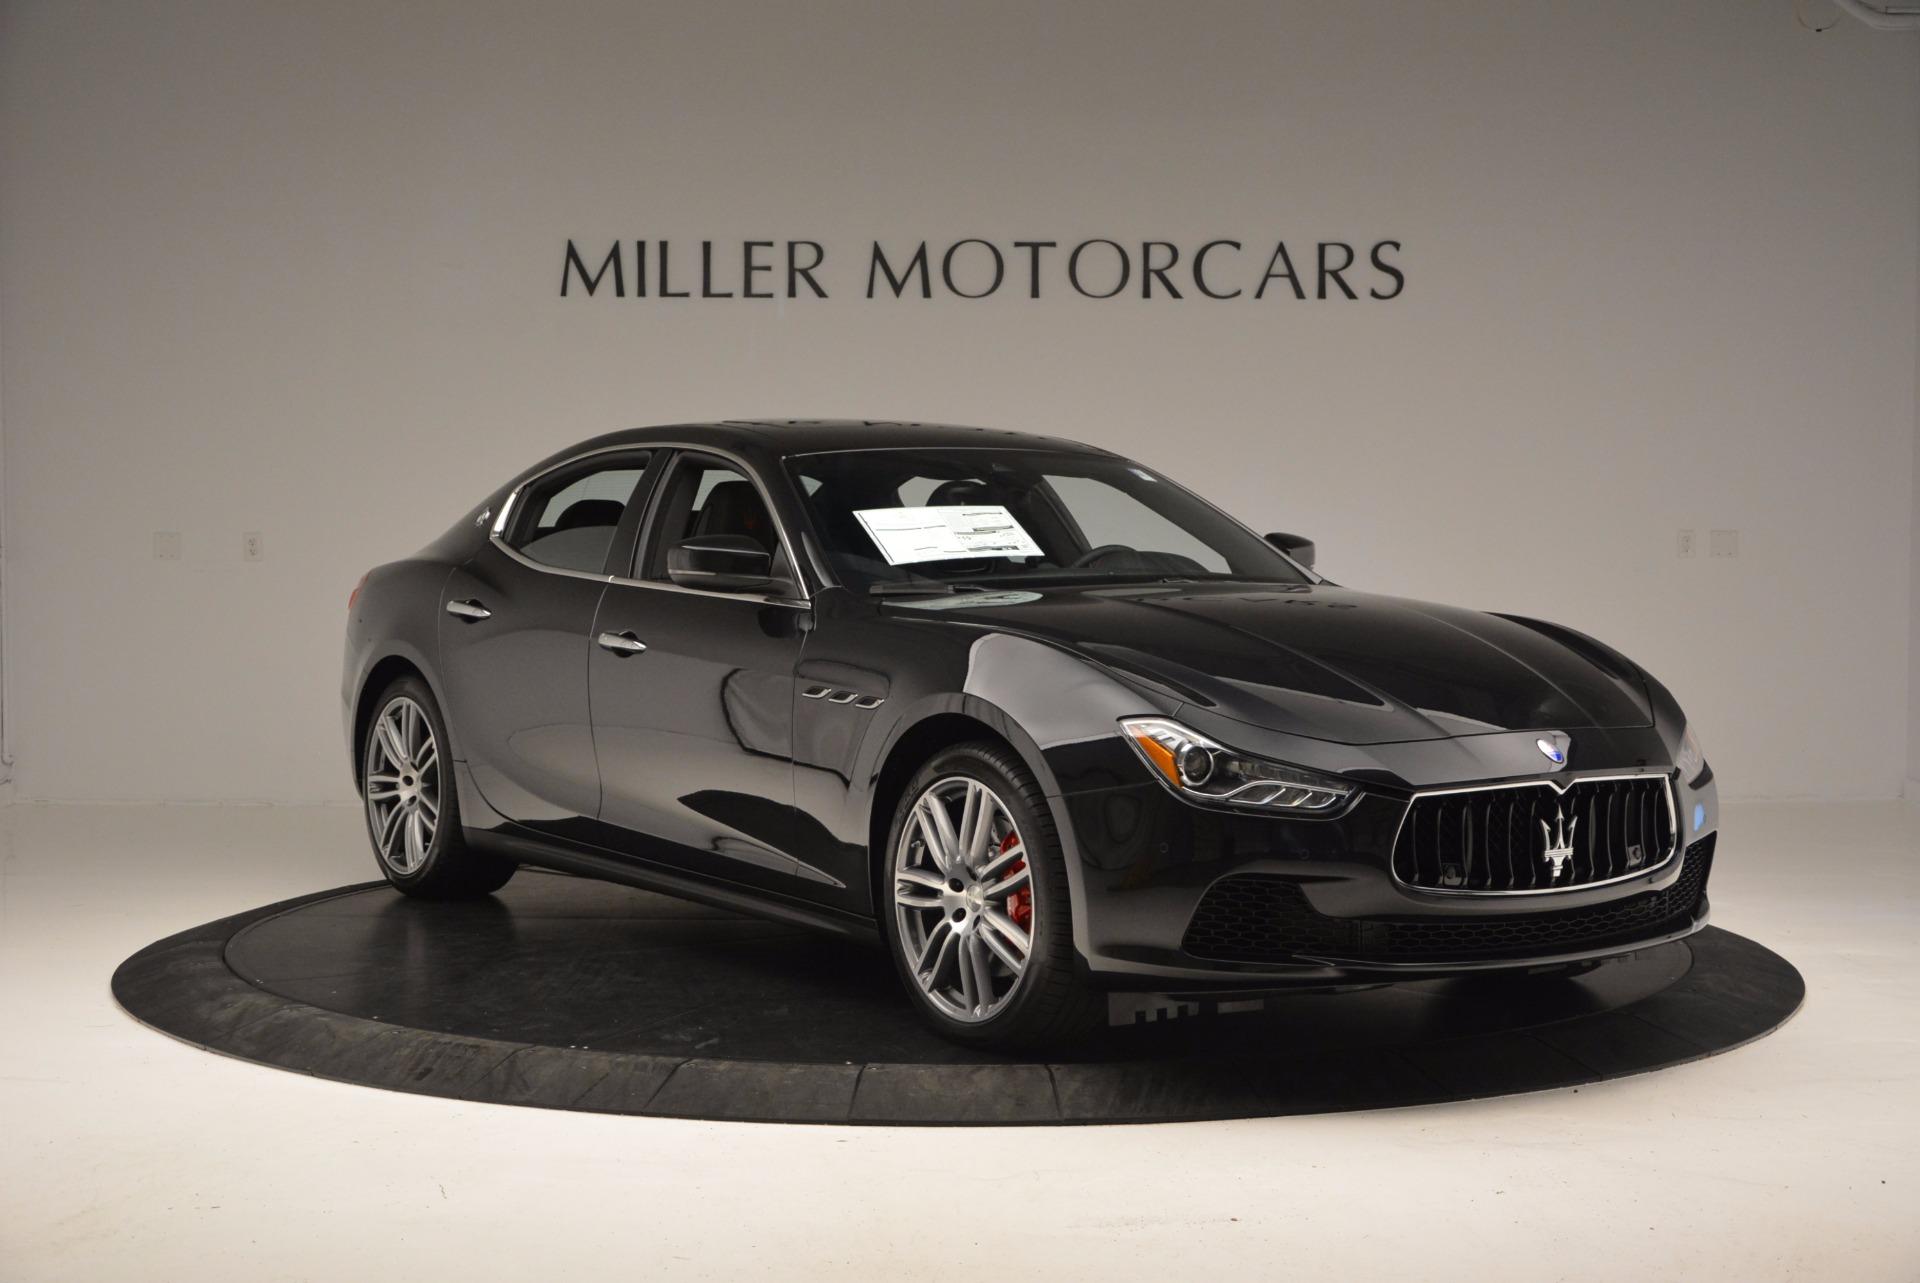 New 2017 Maserati Ghibli SQ4 For Sale In Westport, CT 1108_p11